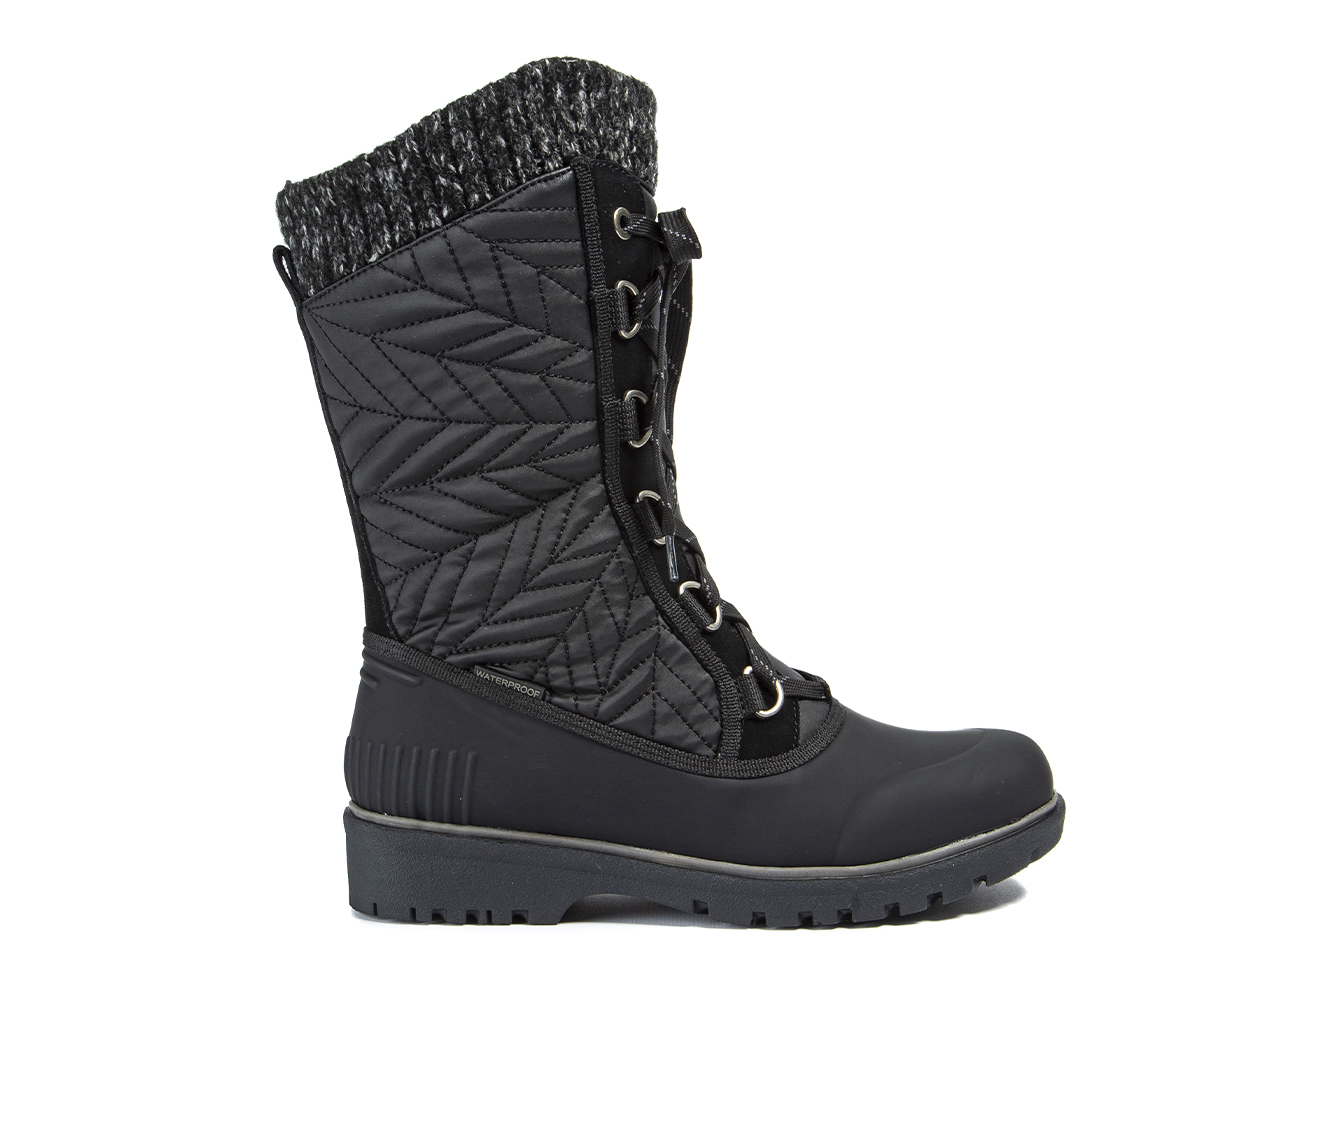 Baretraps Stark Women's Boot (Black Faux Leather)